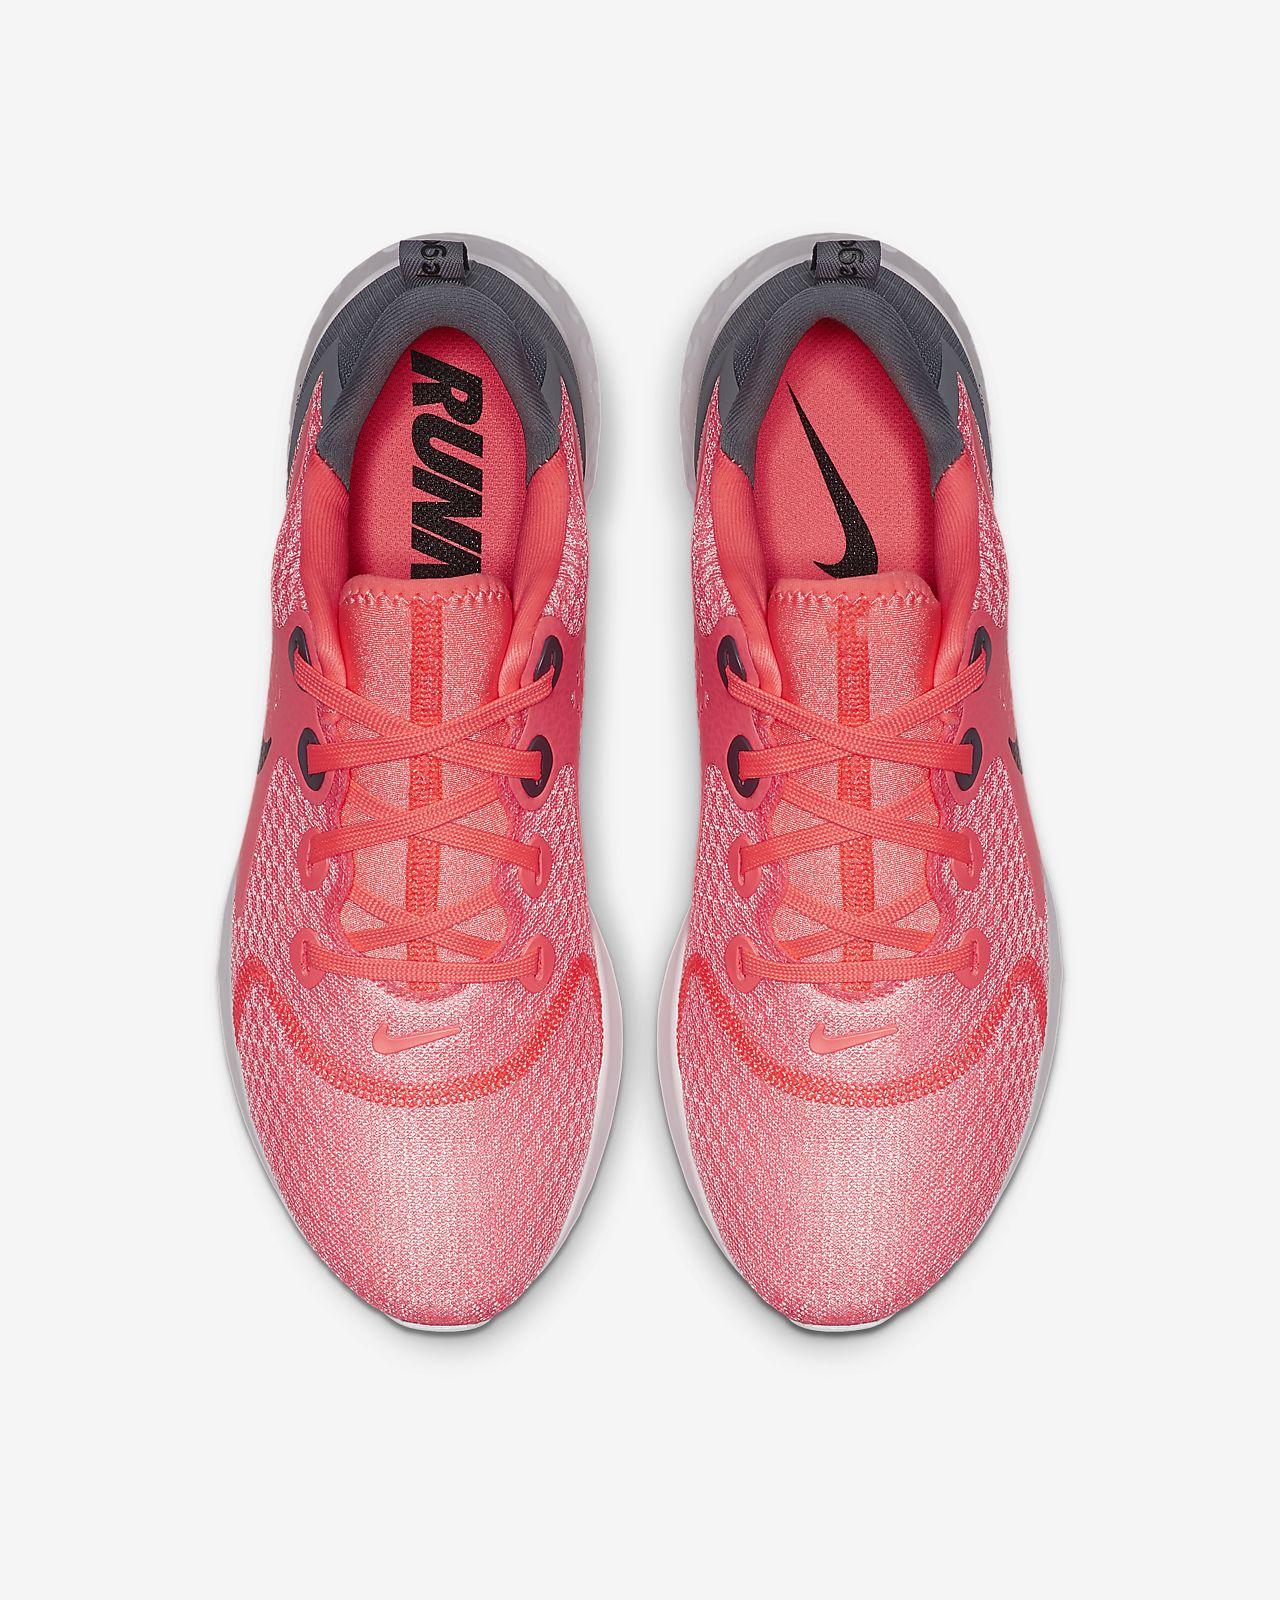 5bae5c7746 Chaussure de running Nike Legend React pour Femme. Nike.com BE